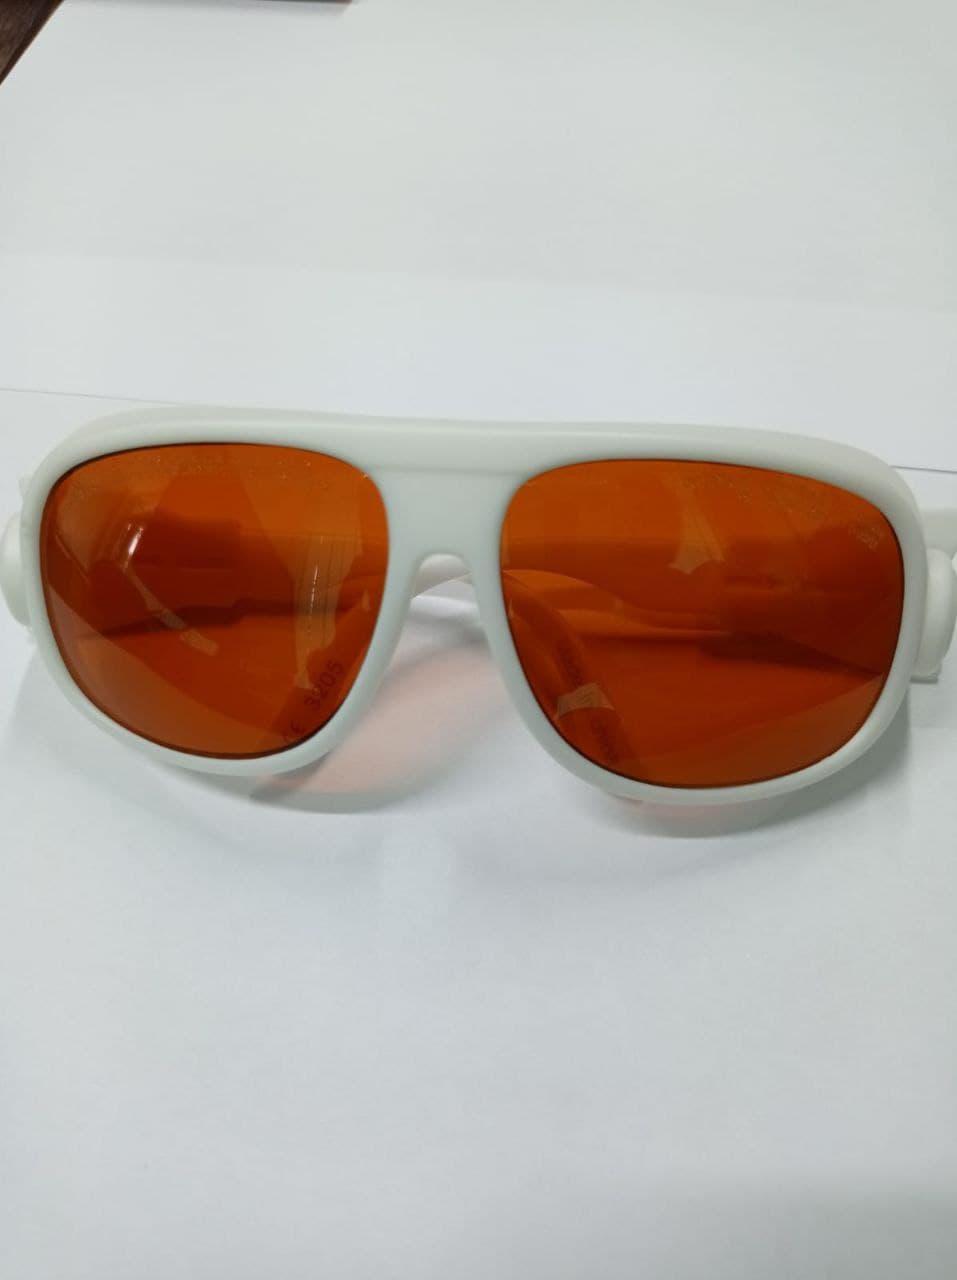 Очки Для Неодимового лазера